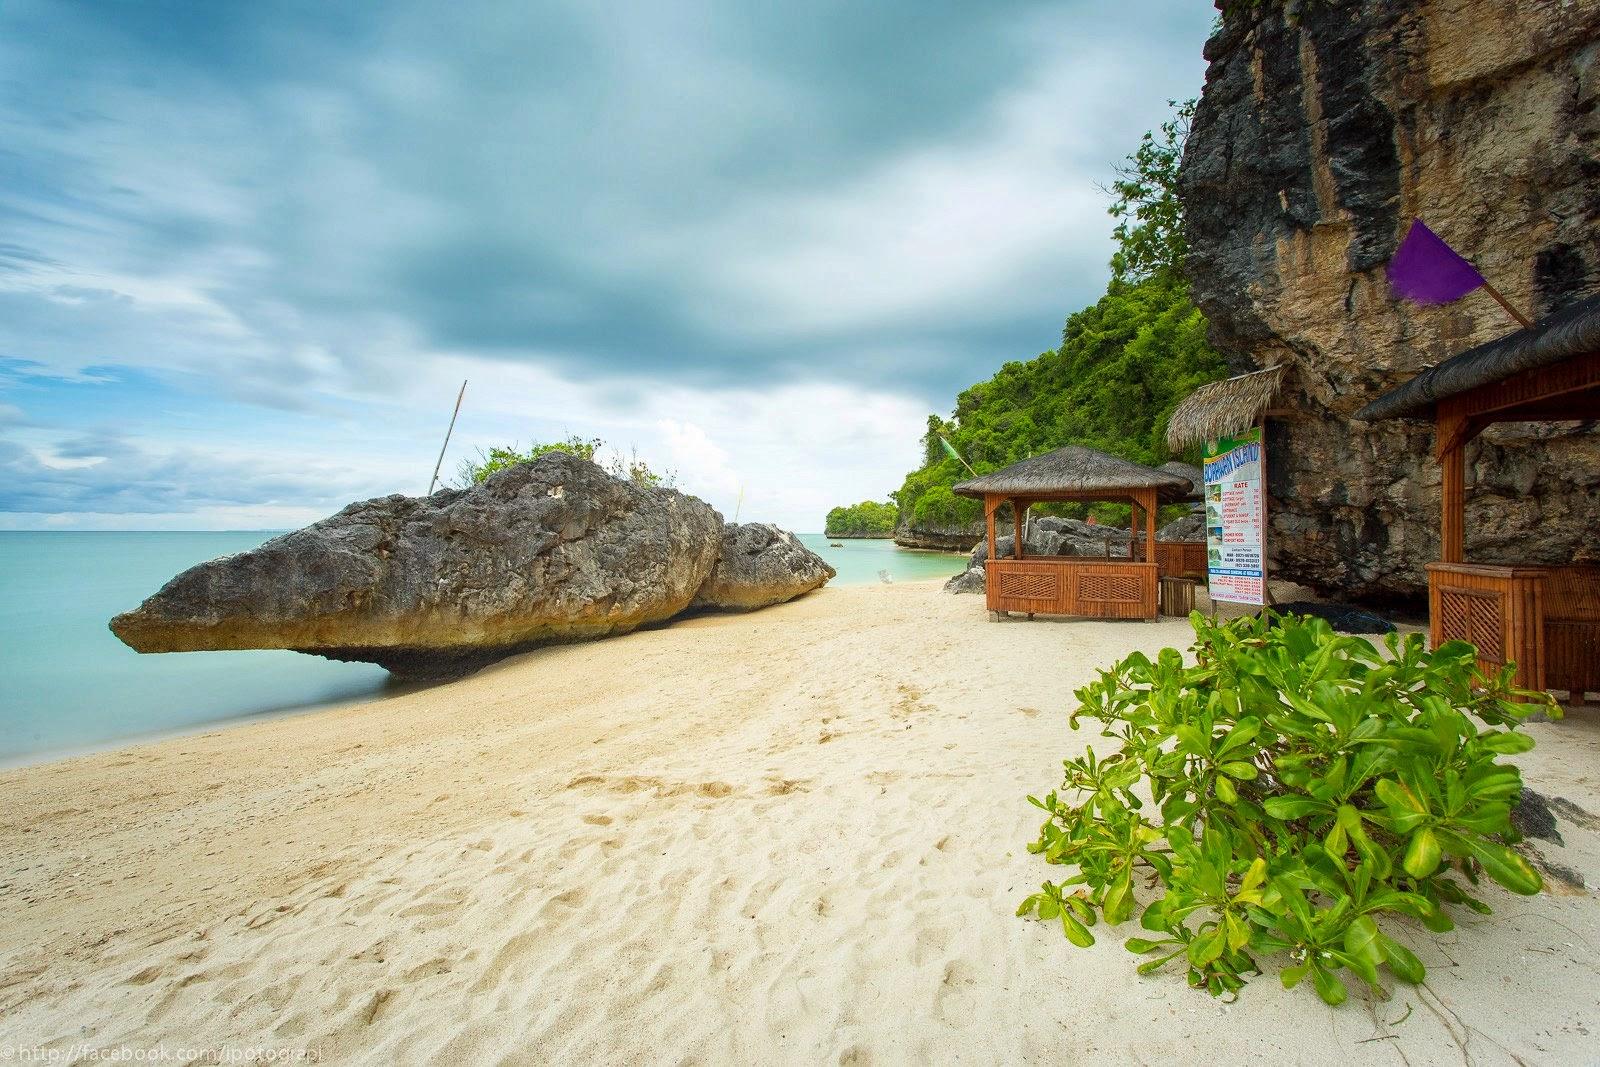 Helping Hands Top 19 Beaches Near Metro Manila